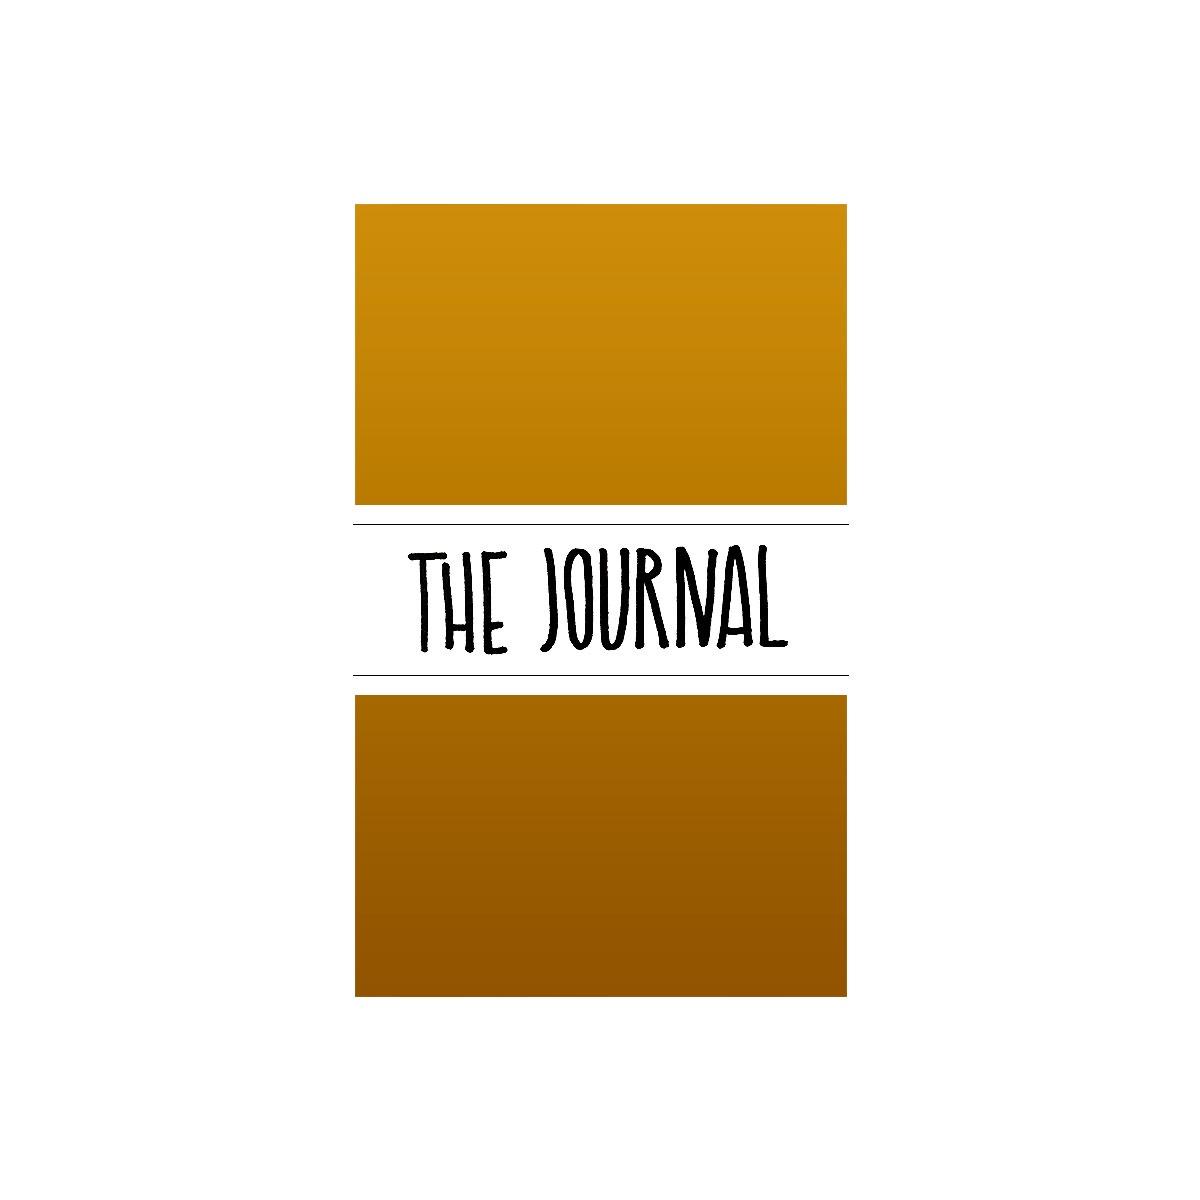 Maxgoodz Ежедневник The Journal Матовое Золото, 2 тетради, A5